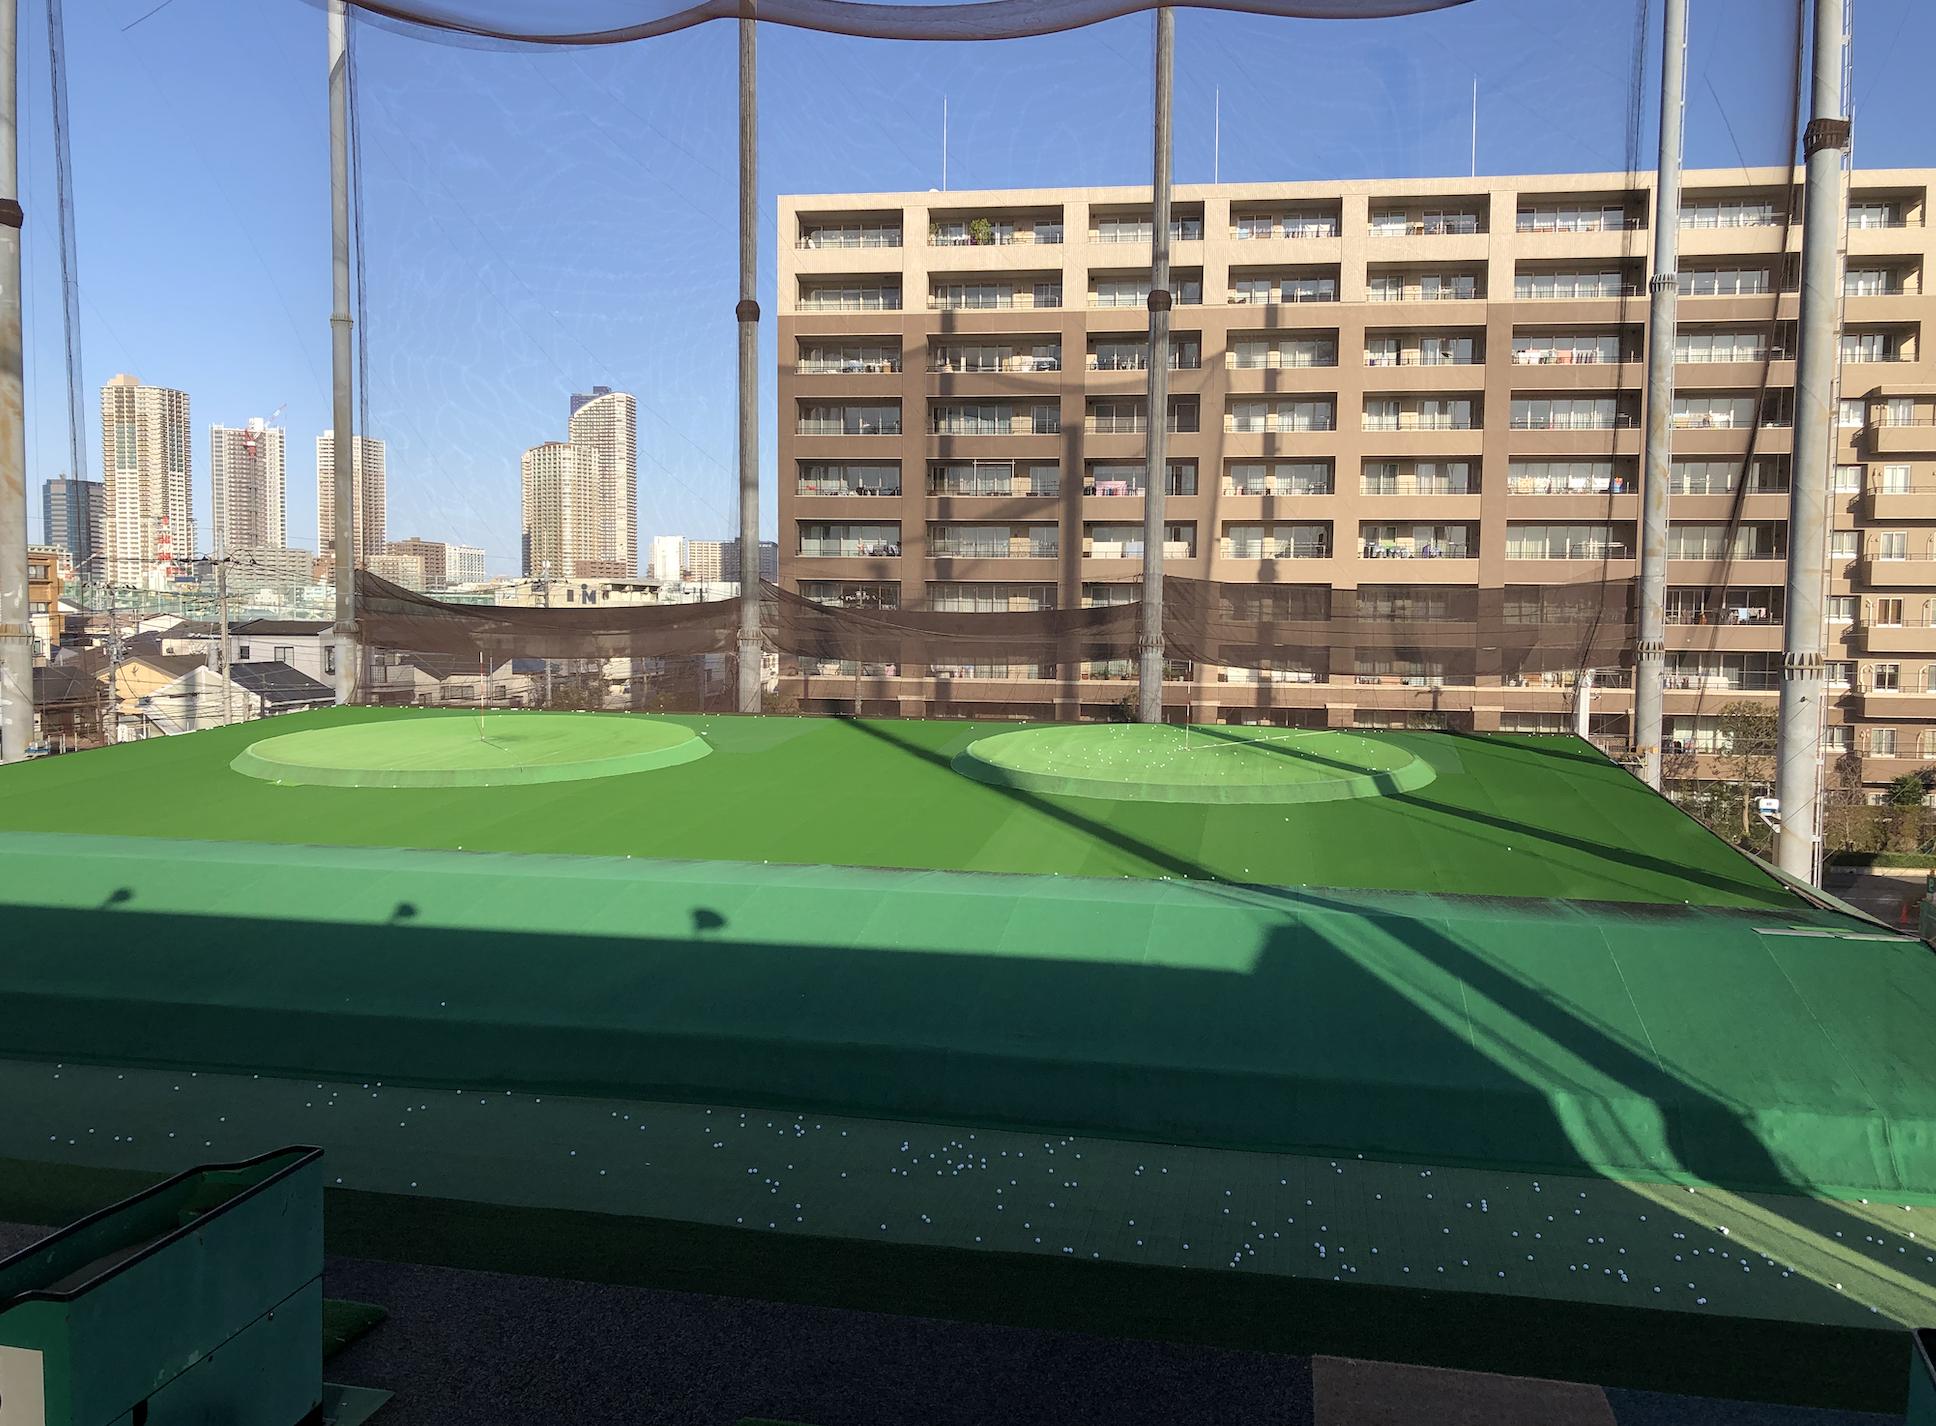 Cover Image for 川崎市のゴルフ練習場(打ちっぱなし)おすすめ9選!